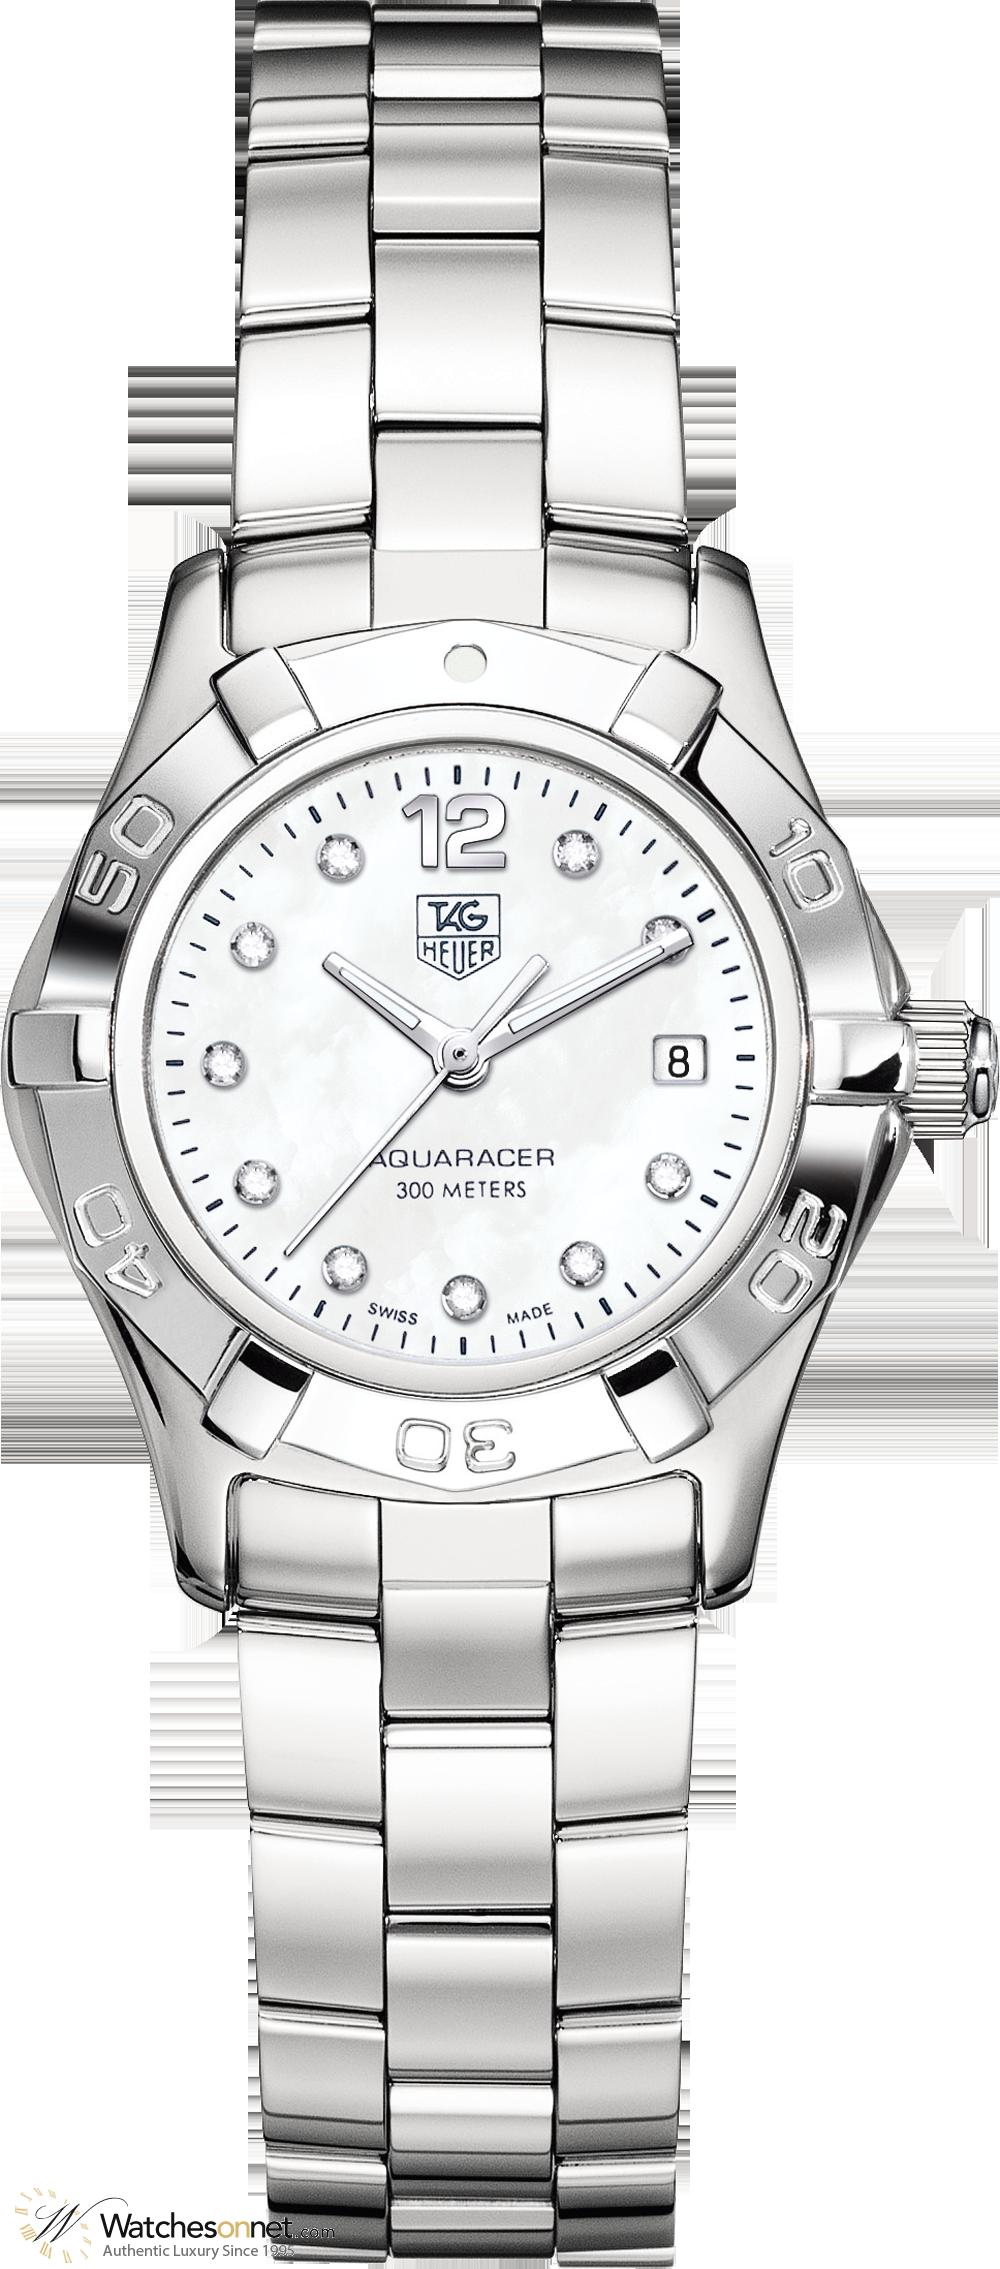 2e8aa9a5038 Tag Heuer Aquaracer WAF1415.BA0824 Women s Stainless Steel Quartz Watch